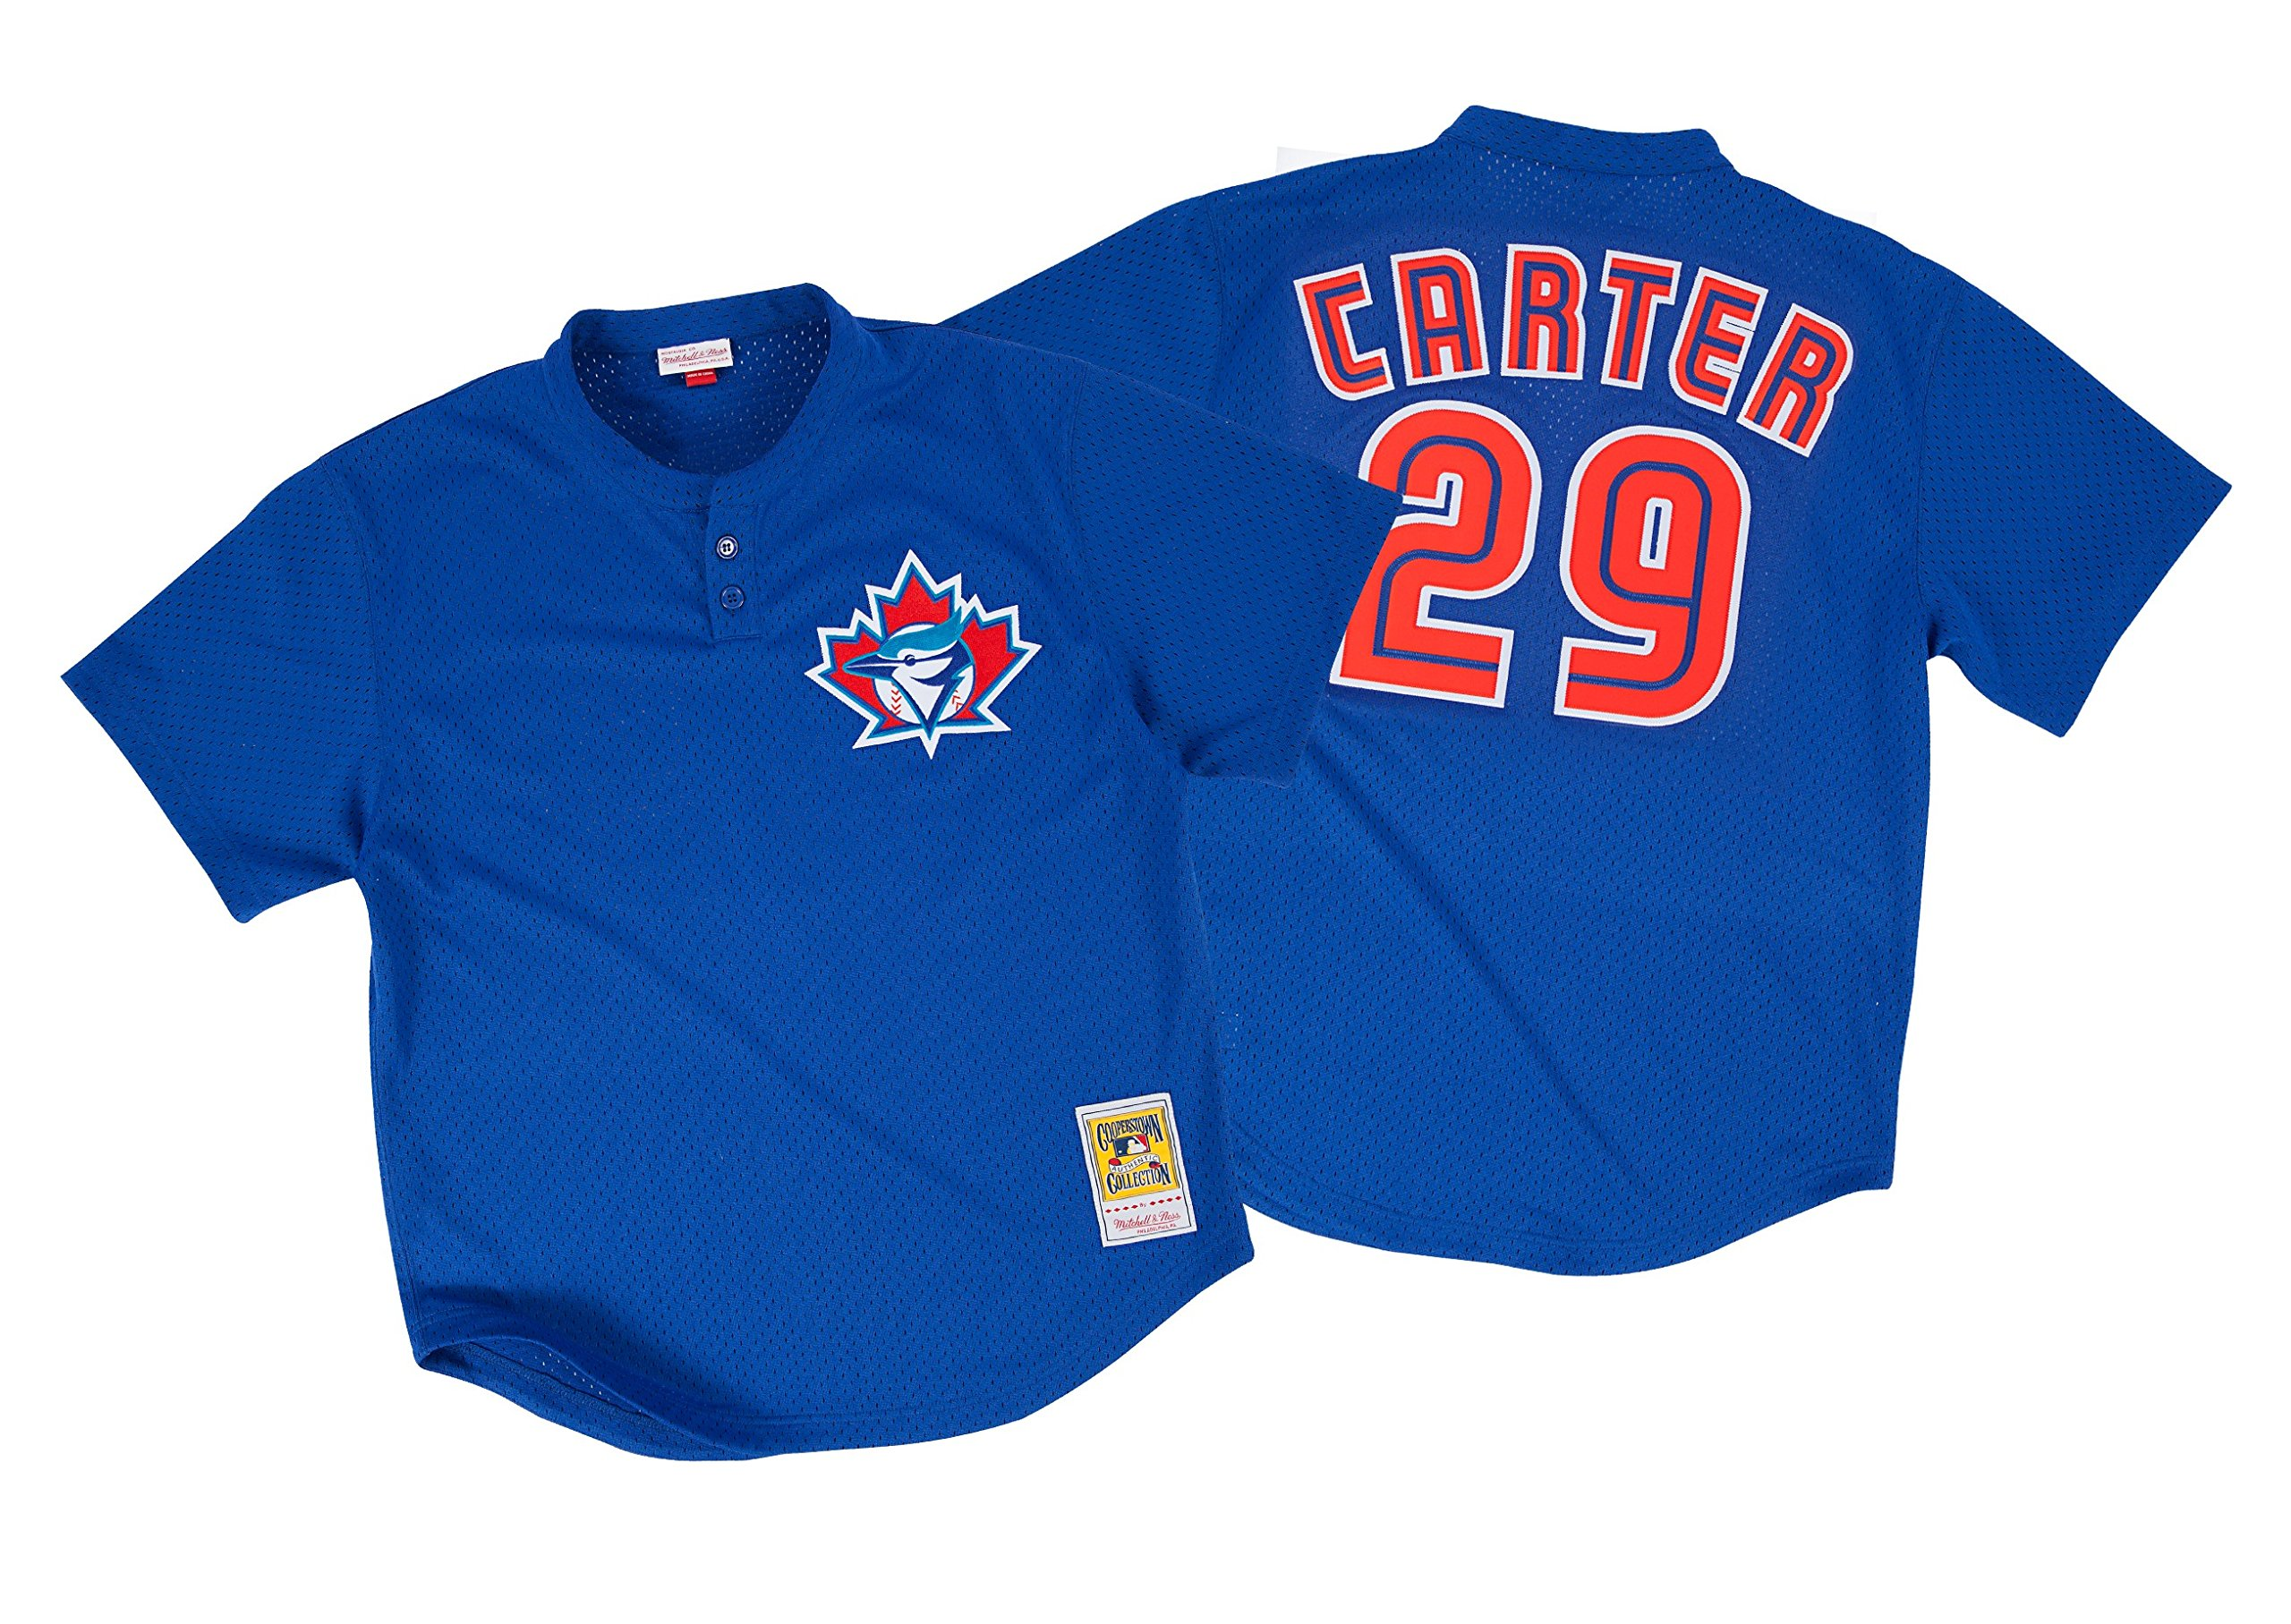 fcc5200251b Joe Carter 1997 Toronto Blue Jays Authentic Mesh Batting Practice Jersey  (56 3XL) Misc.